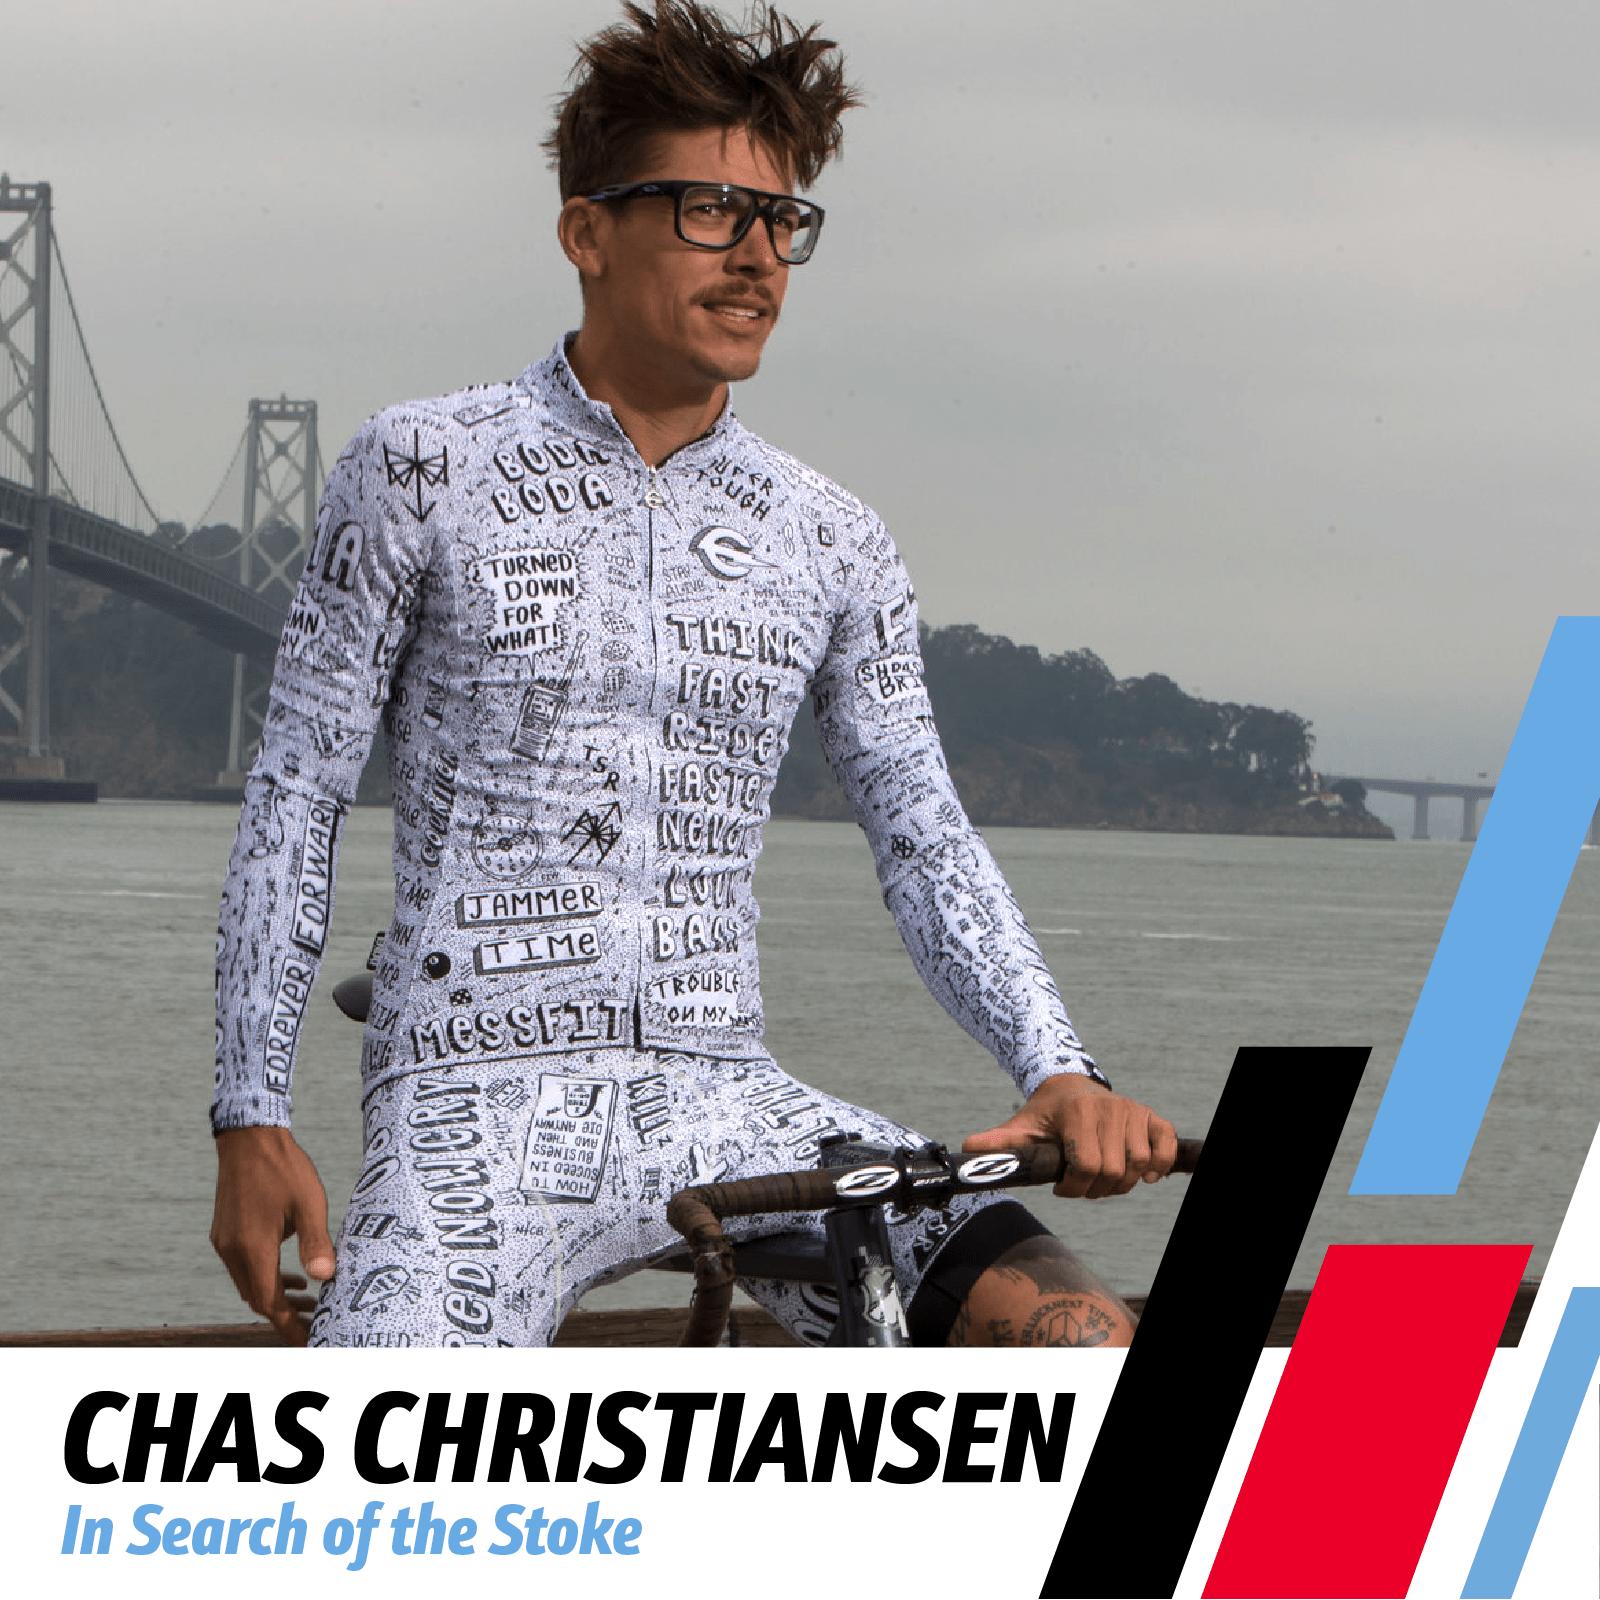 Chas Christiansen